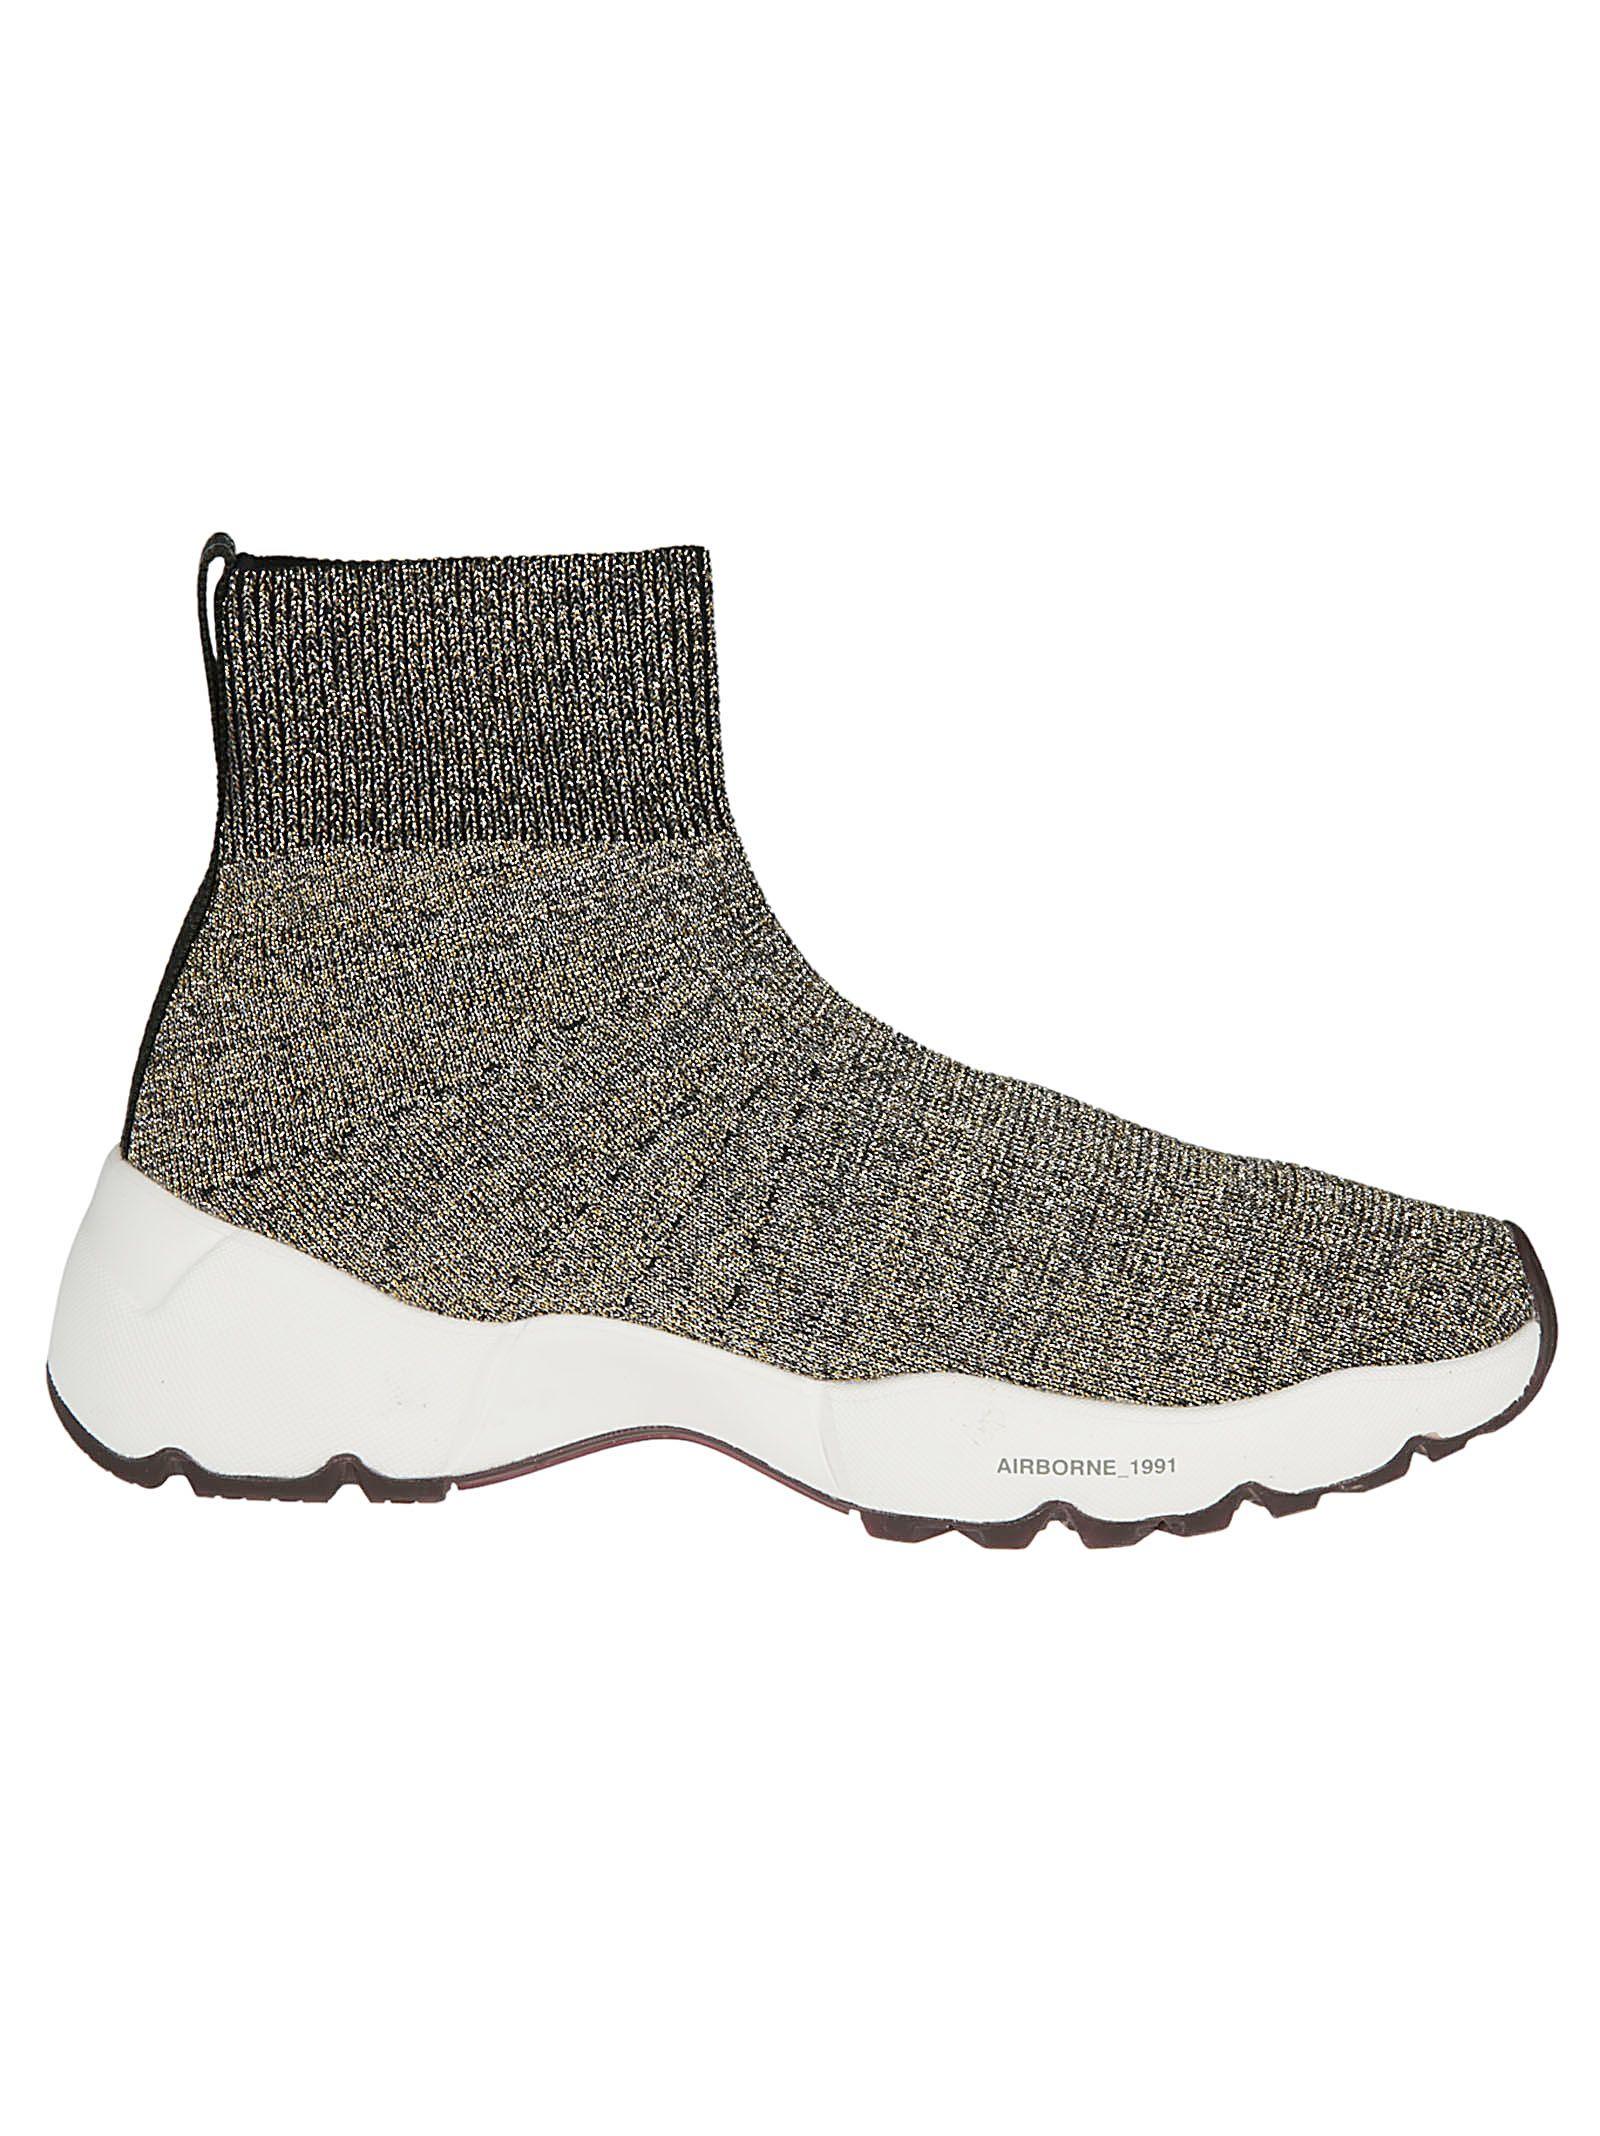 OXS Oxs Airborne Sock Sneakers in Oro/Nero